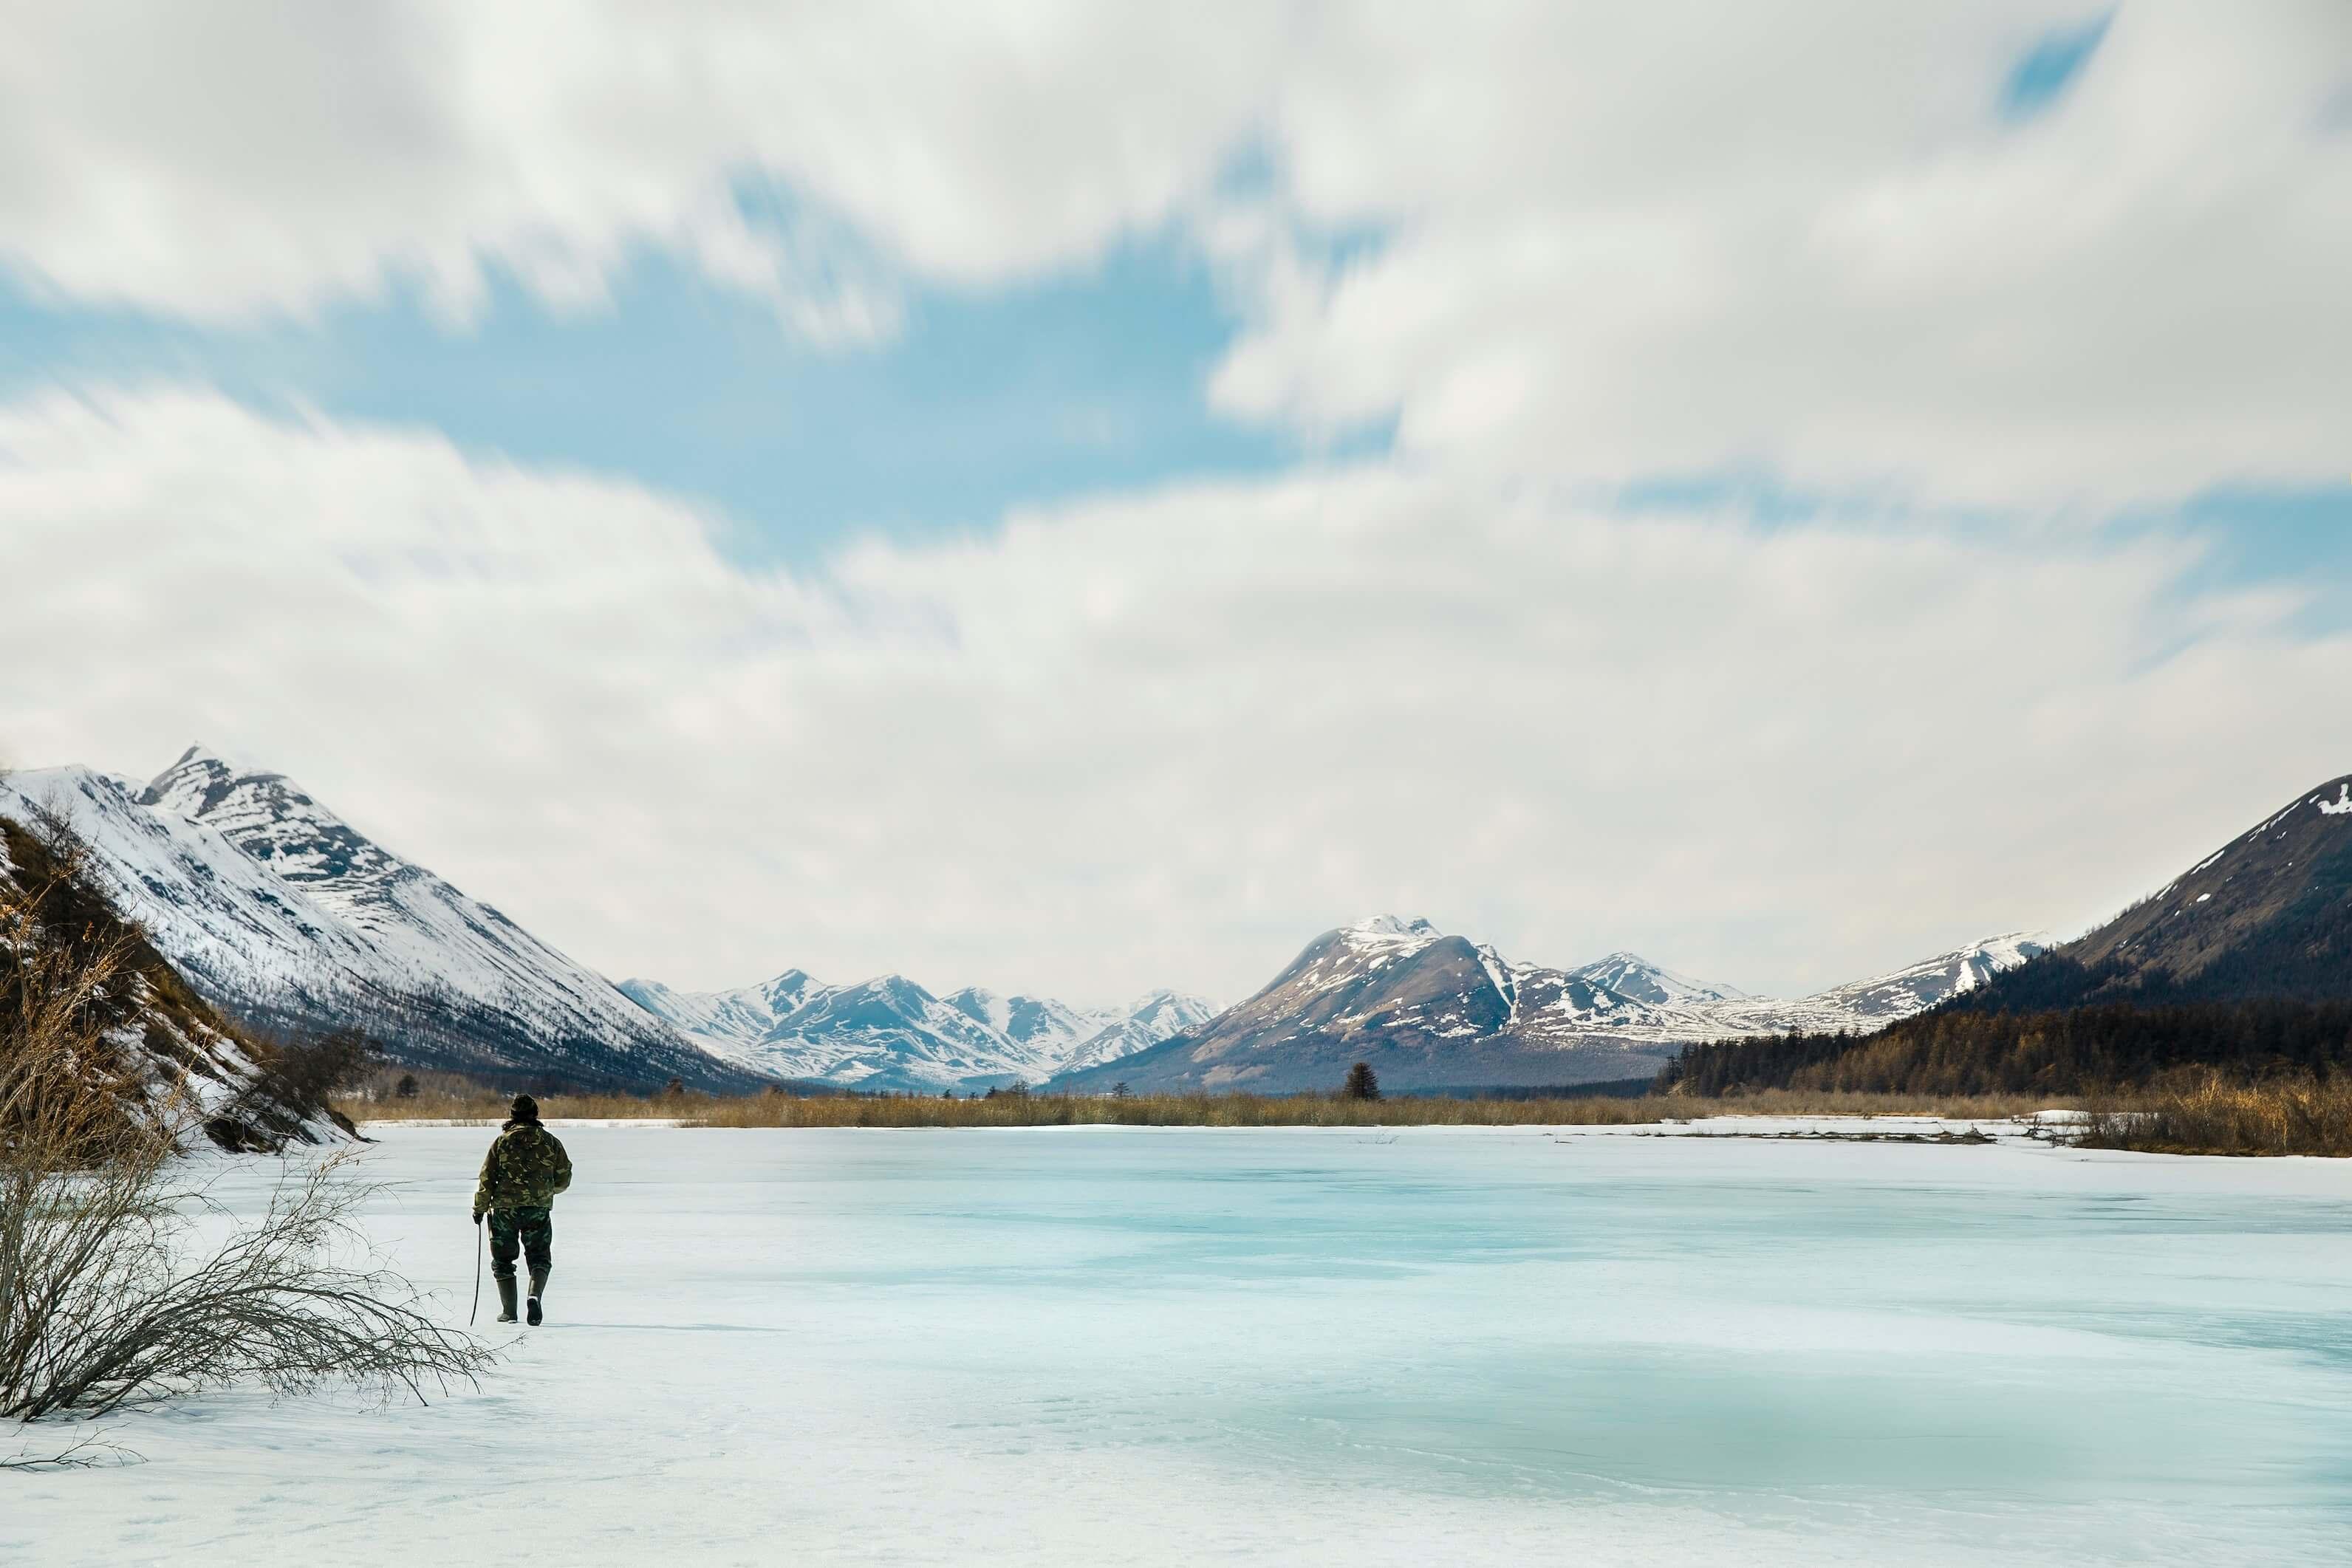 Кадр из фильма "24 снега"